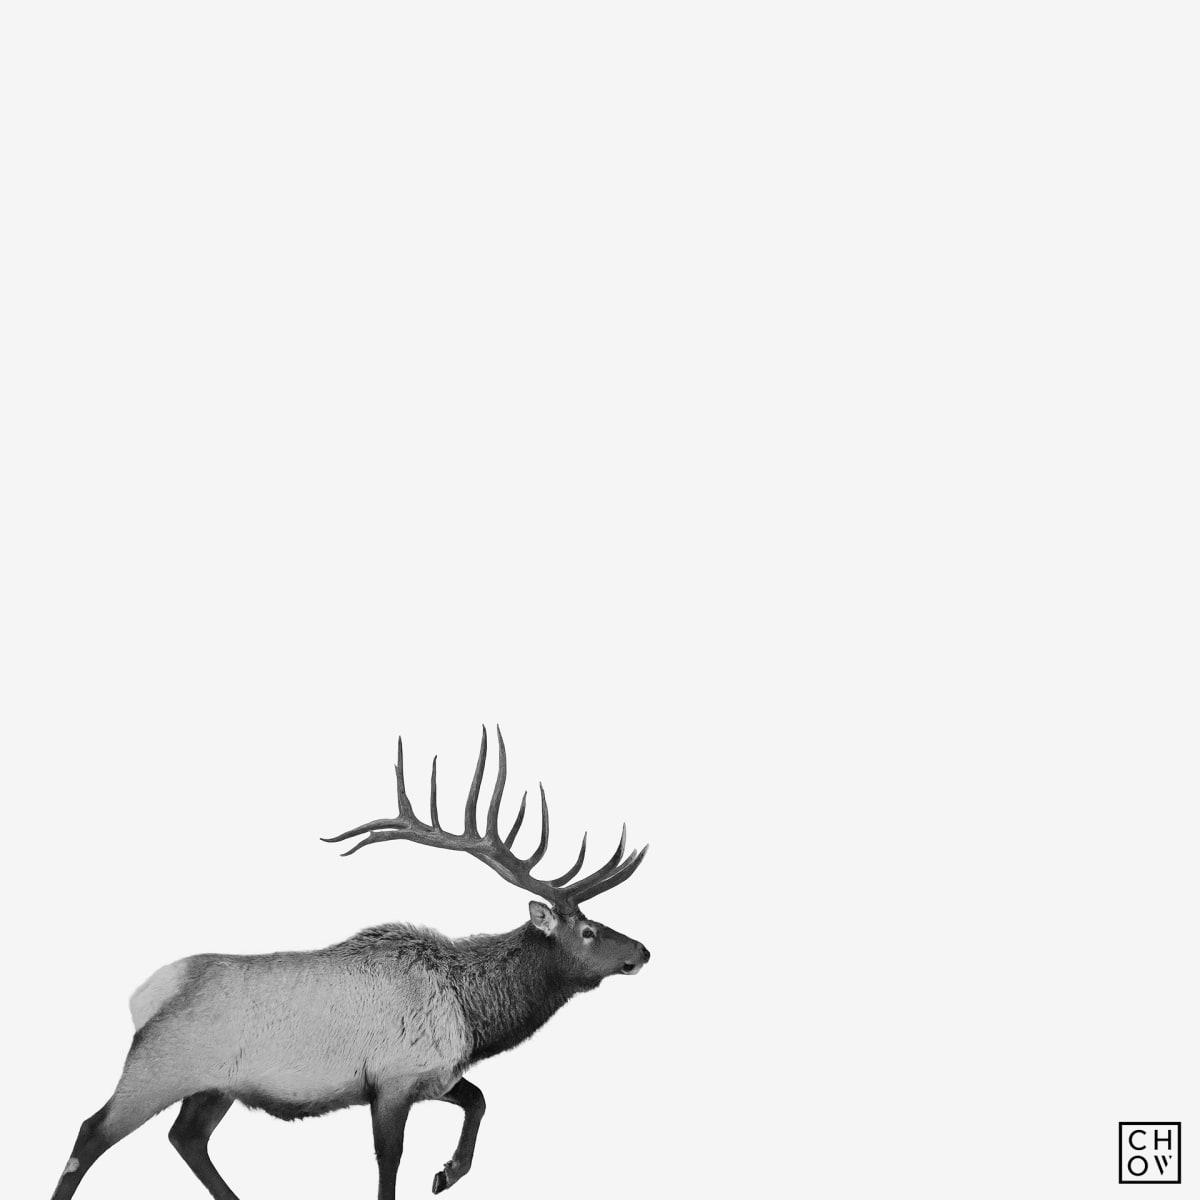 Austin Chow, Elk // Jackson, Wyoming, 2019